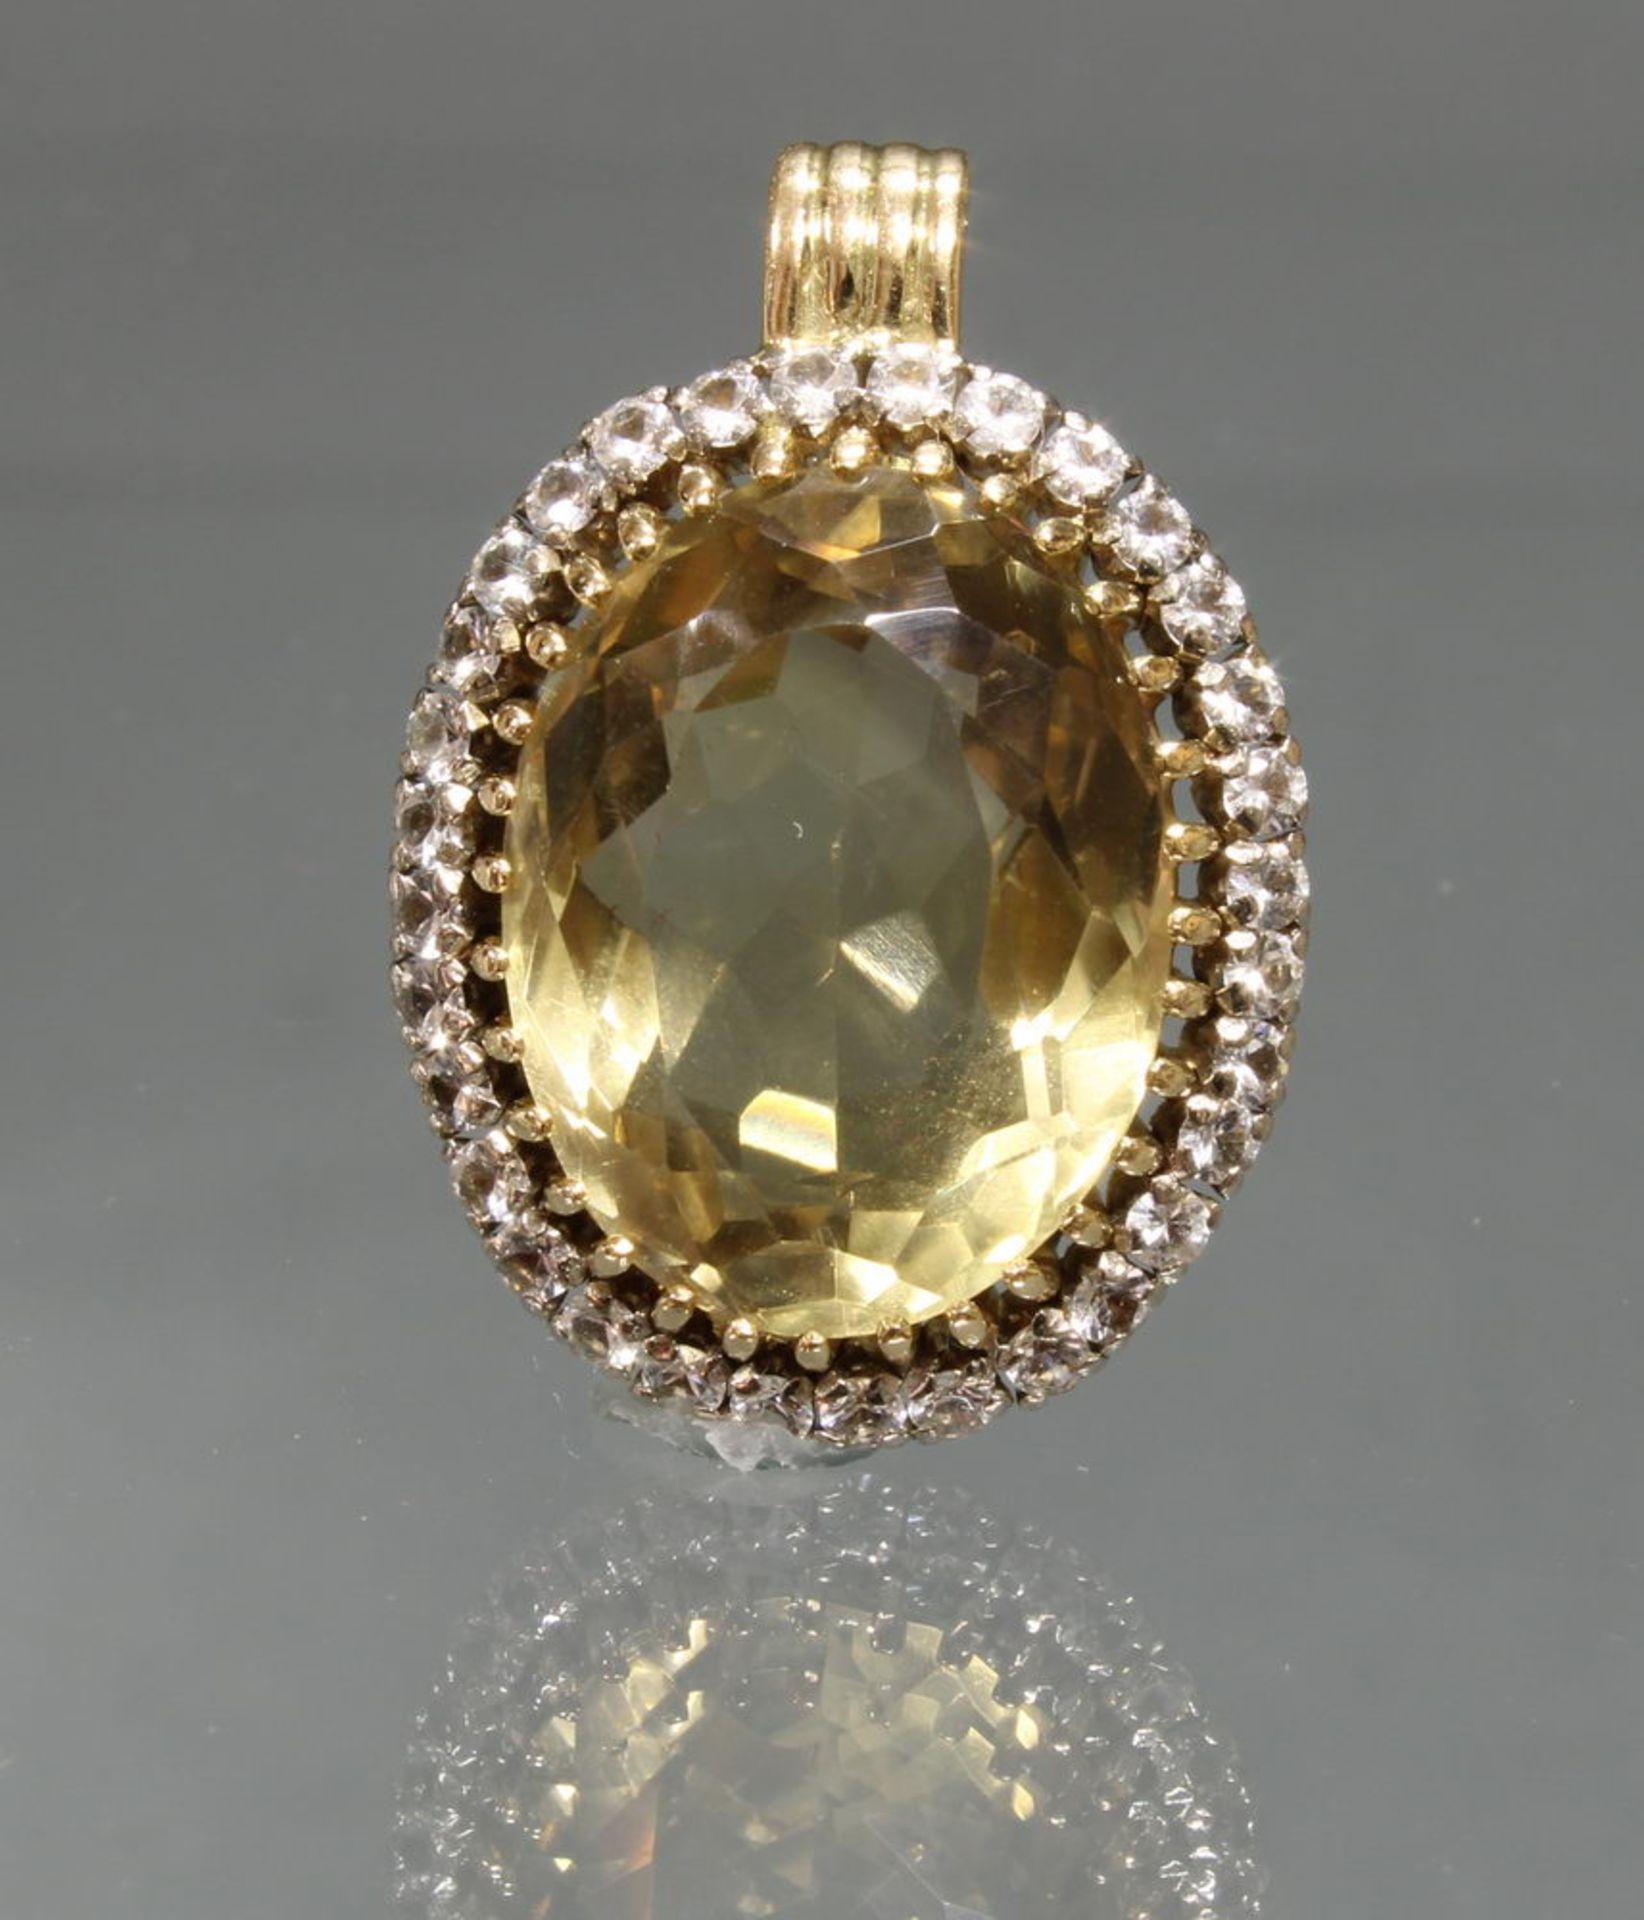 Anhänger, WG/GG 585, 32 8/8-Diamanten, 1 oval facettierter Citrin, 11 g